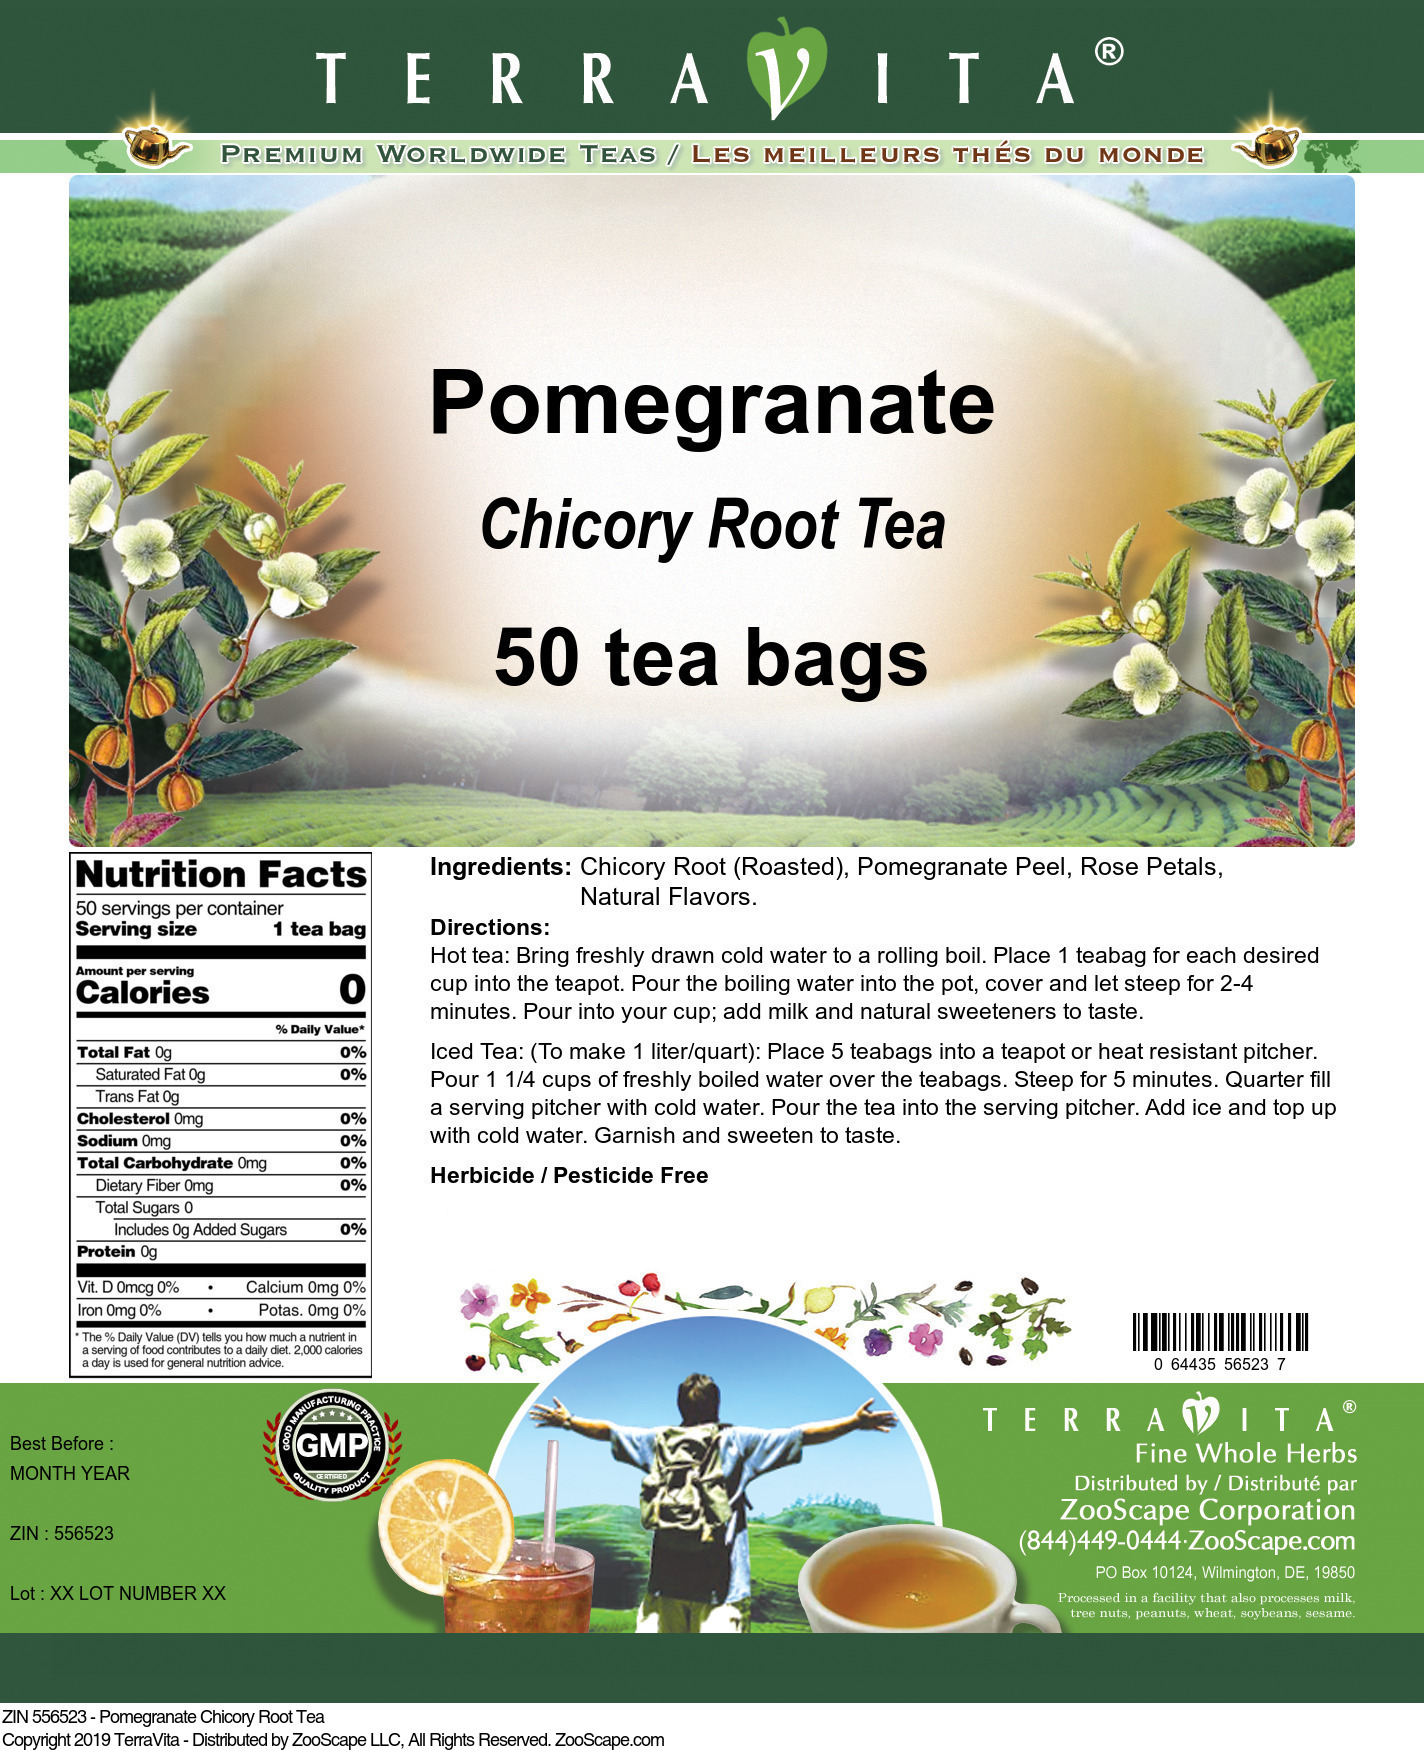 Pomegranate Chicory Root